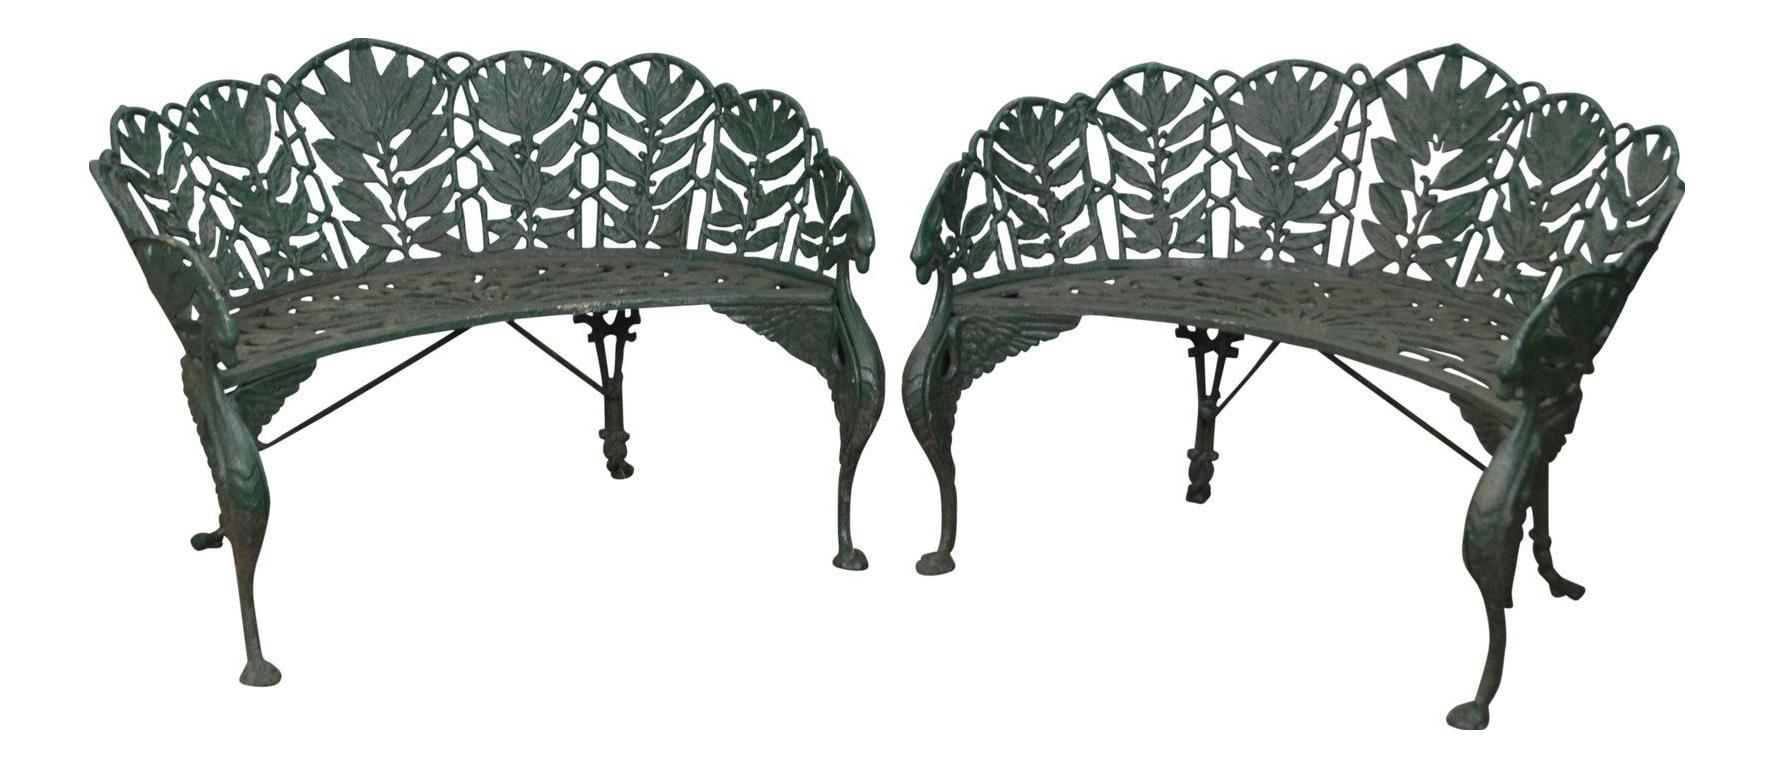 Antique Coalbrookdale Style Laurel Pattern Cast Iron Garden Benches   A Pair